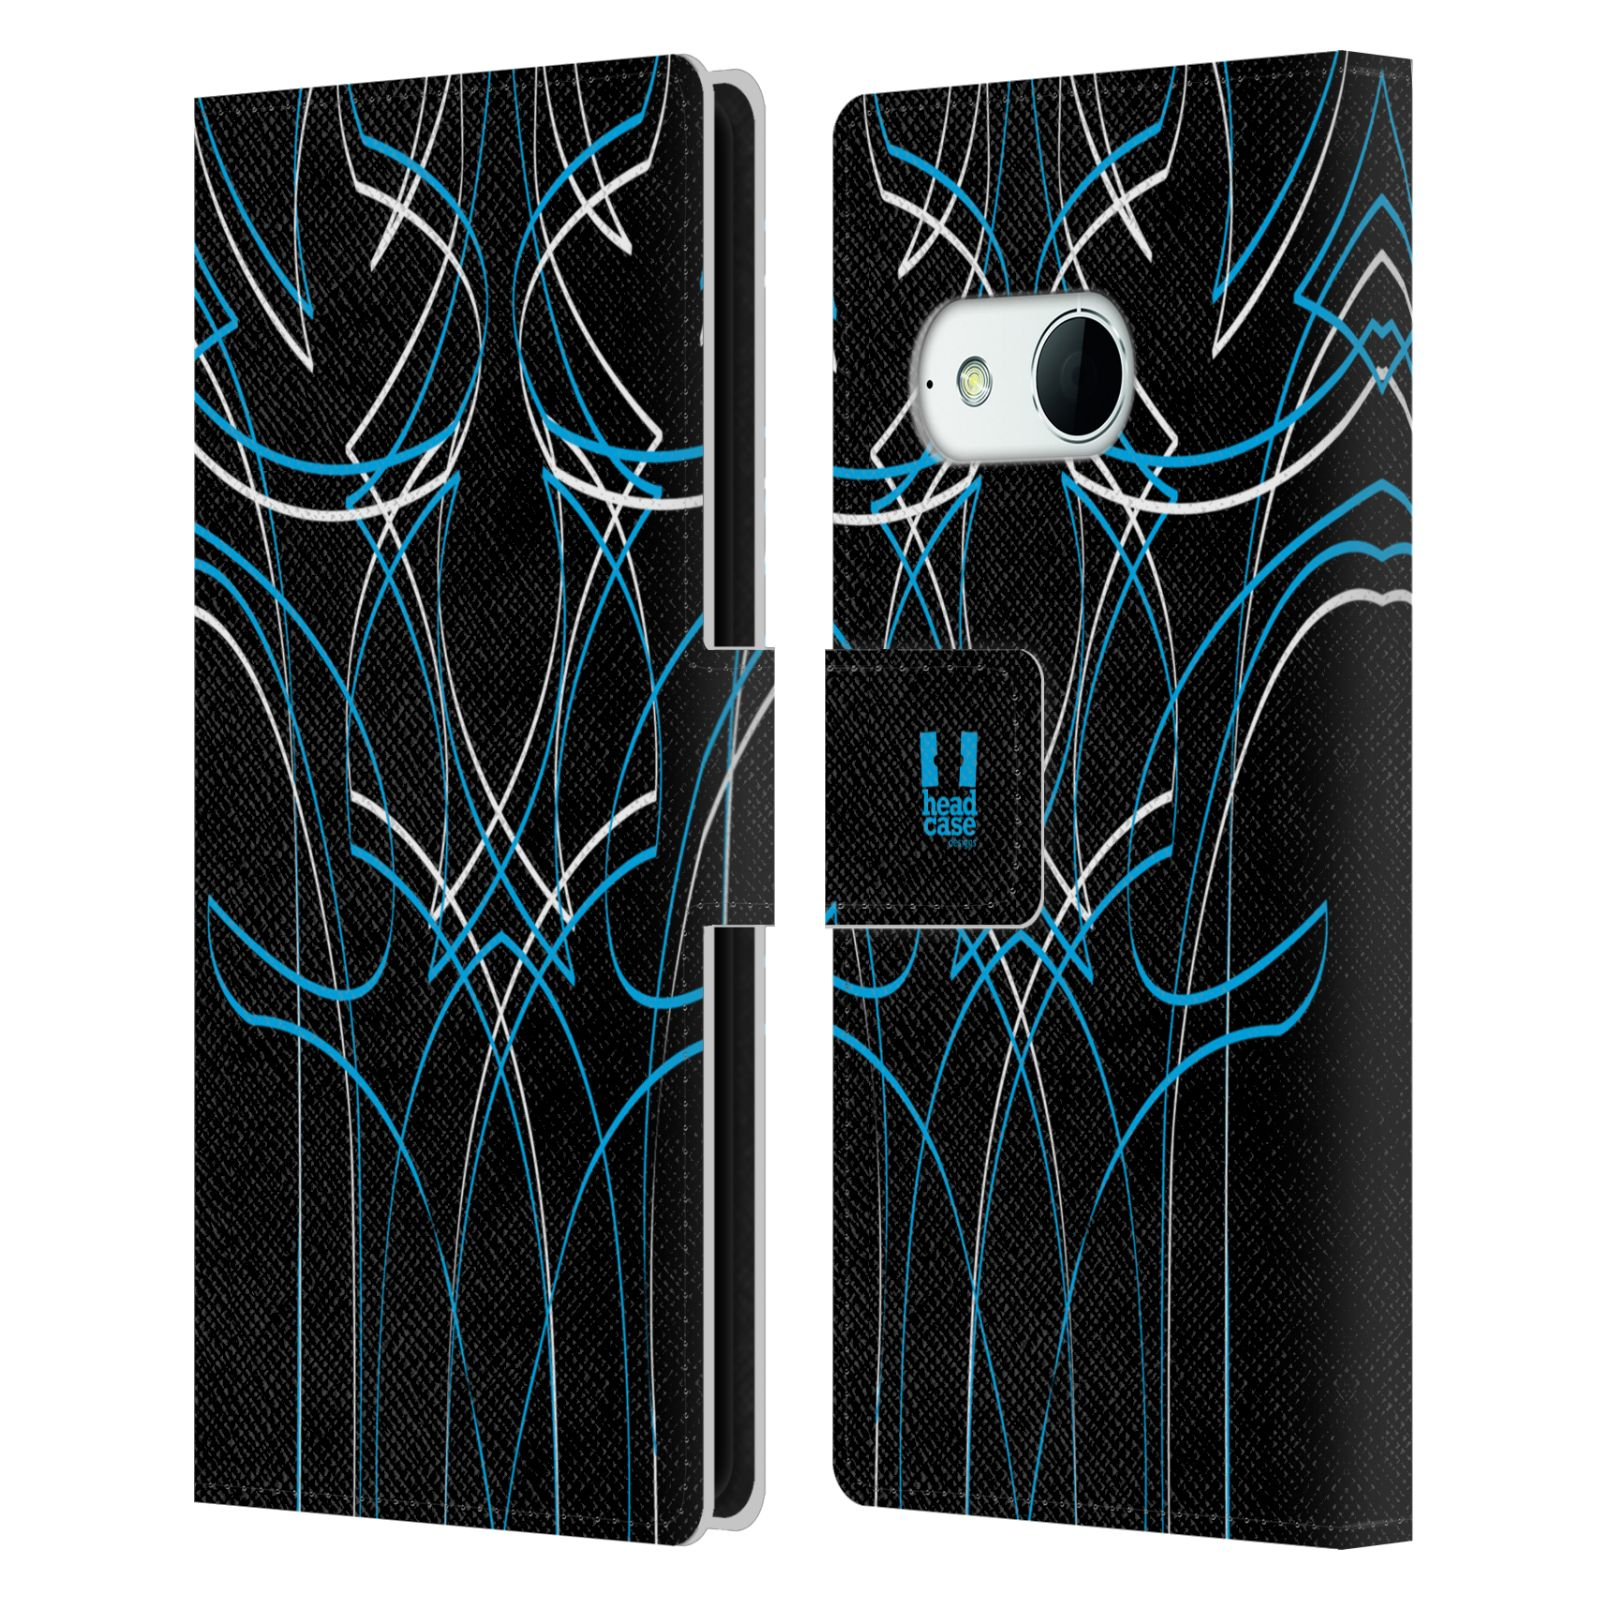 HEAD CASE Flipové pouzdro pro mobil HTC ONE MINI 2 (M8) barevné proužky tvary modrá